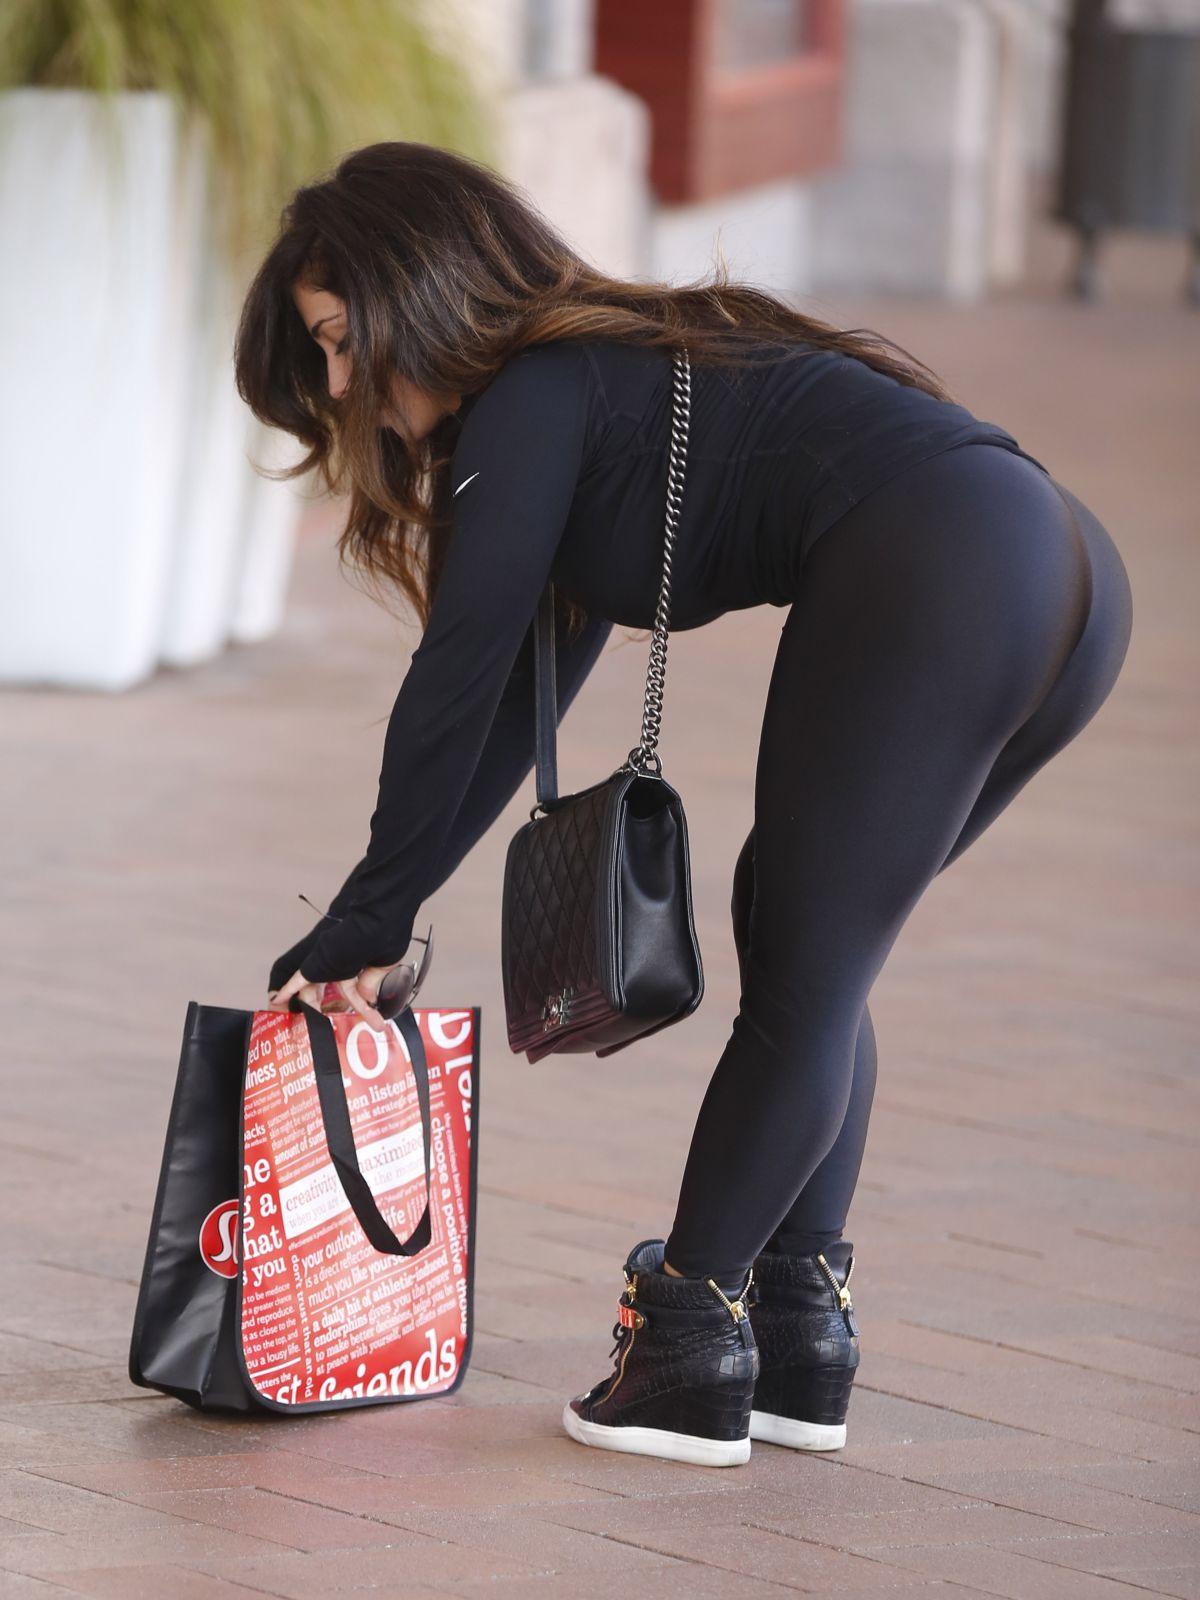 CARMEN ORTEGA in Tights Out Shopping in Orange County